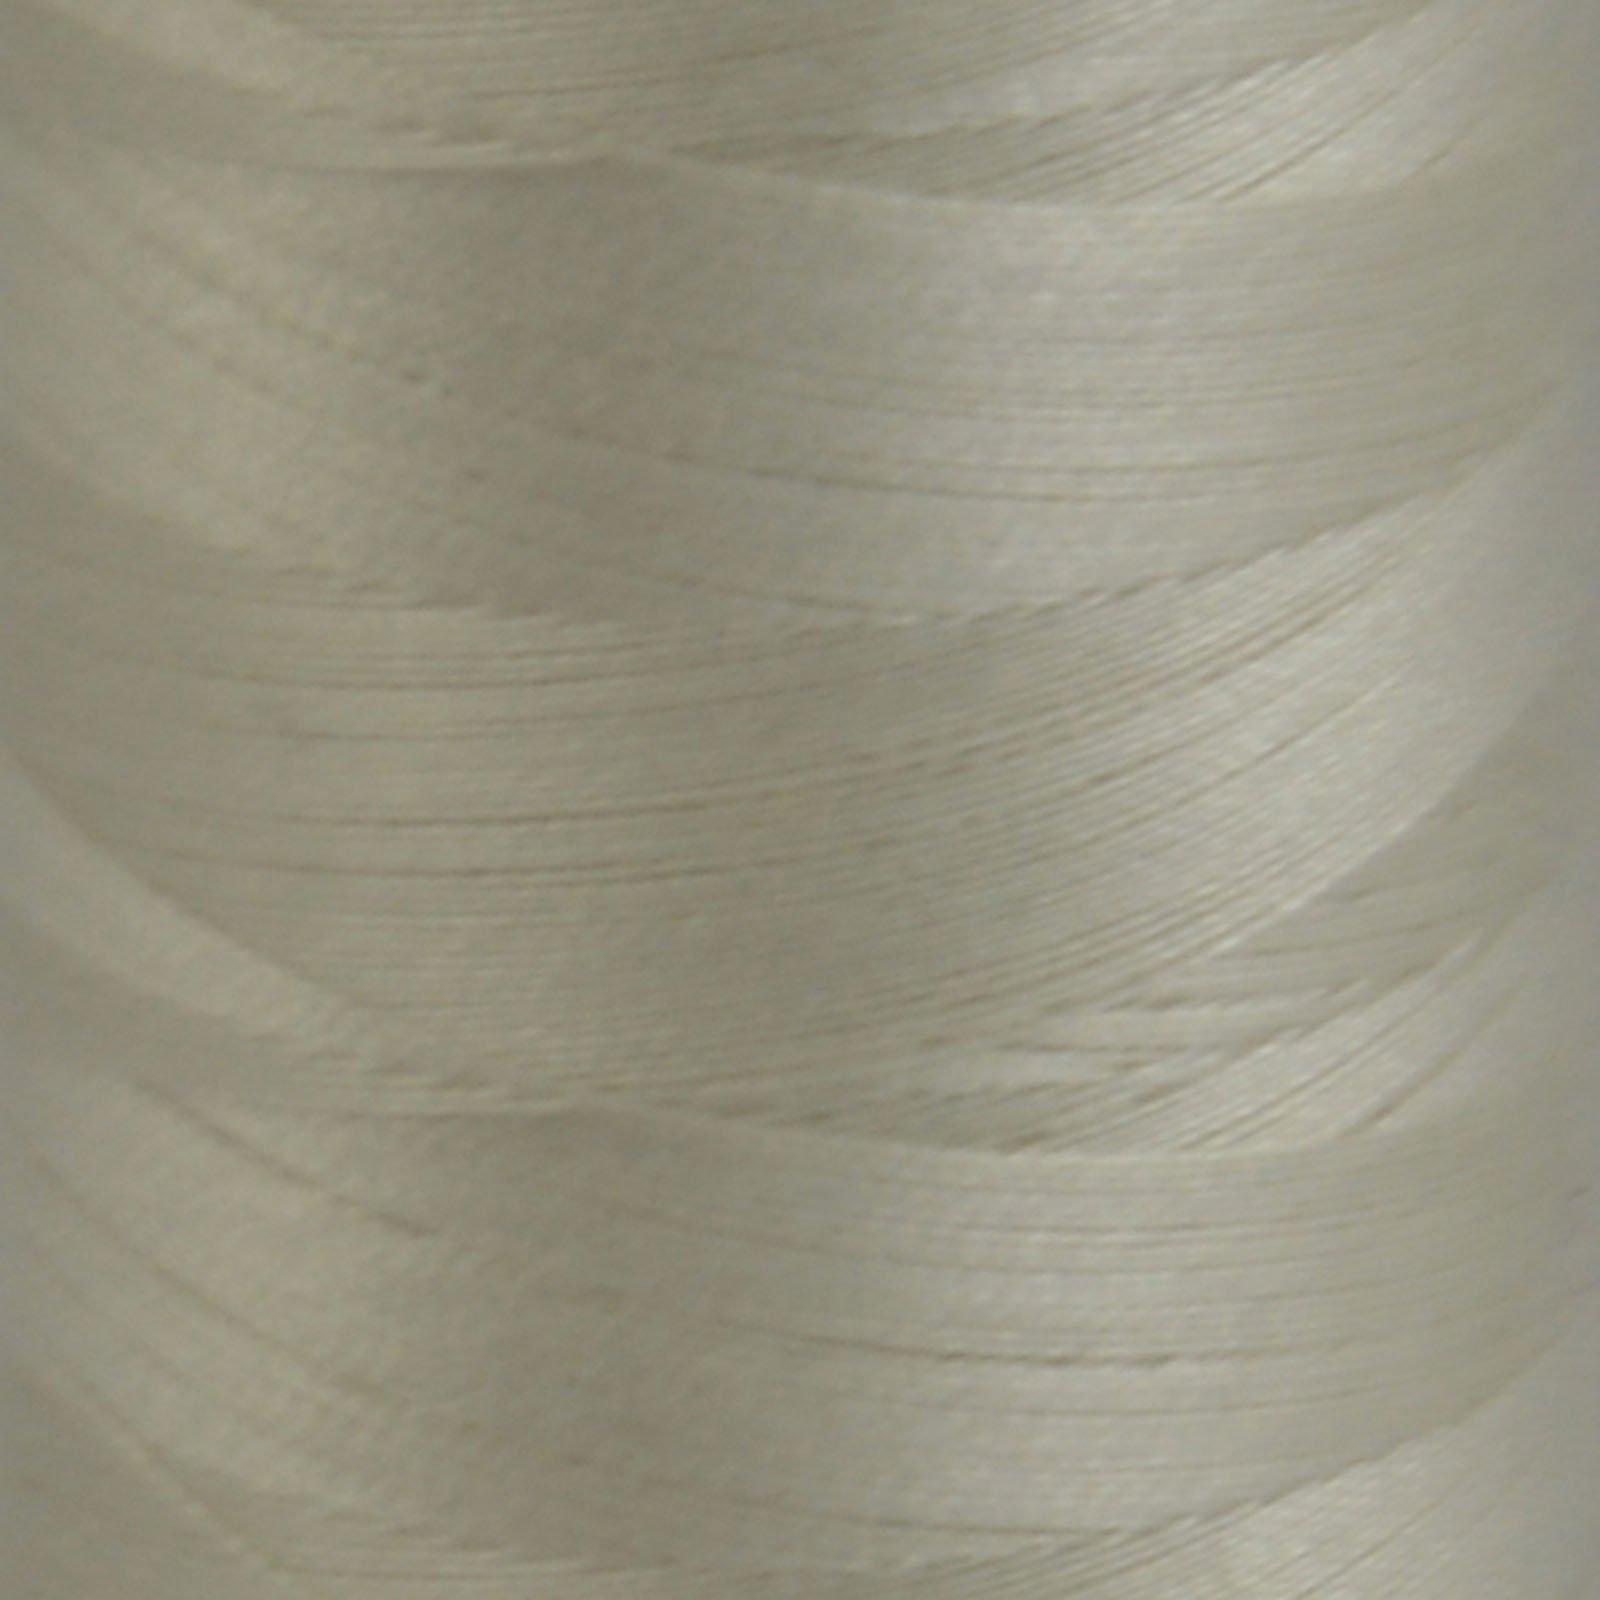 # 2309 Silver White